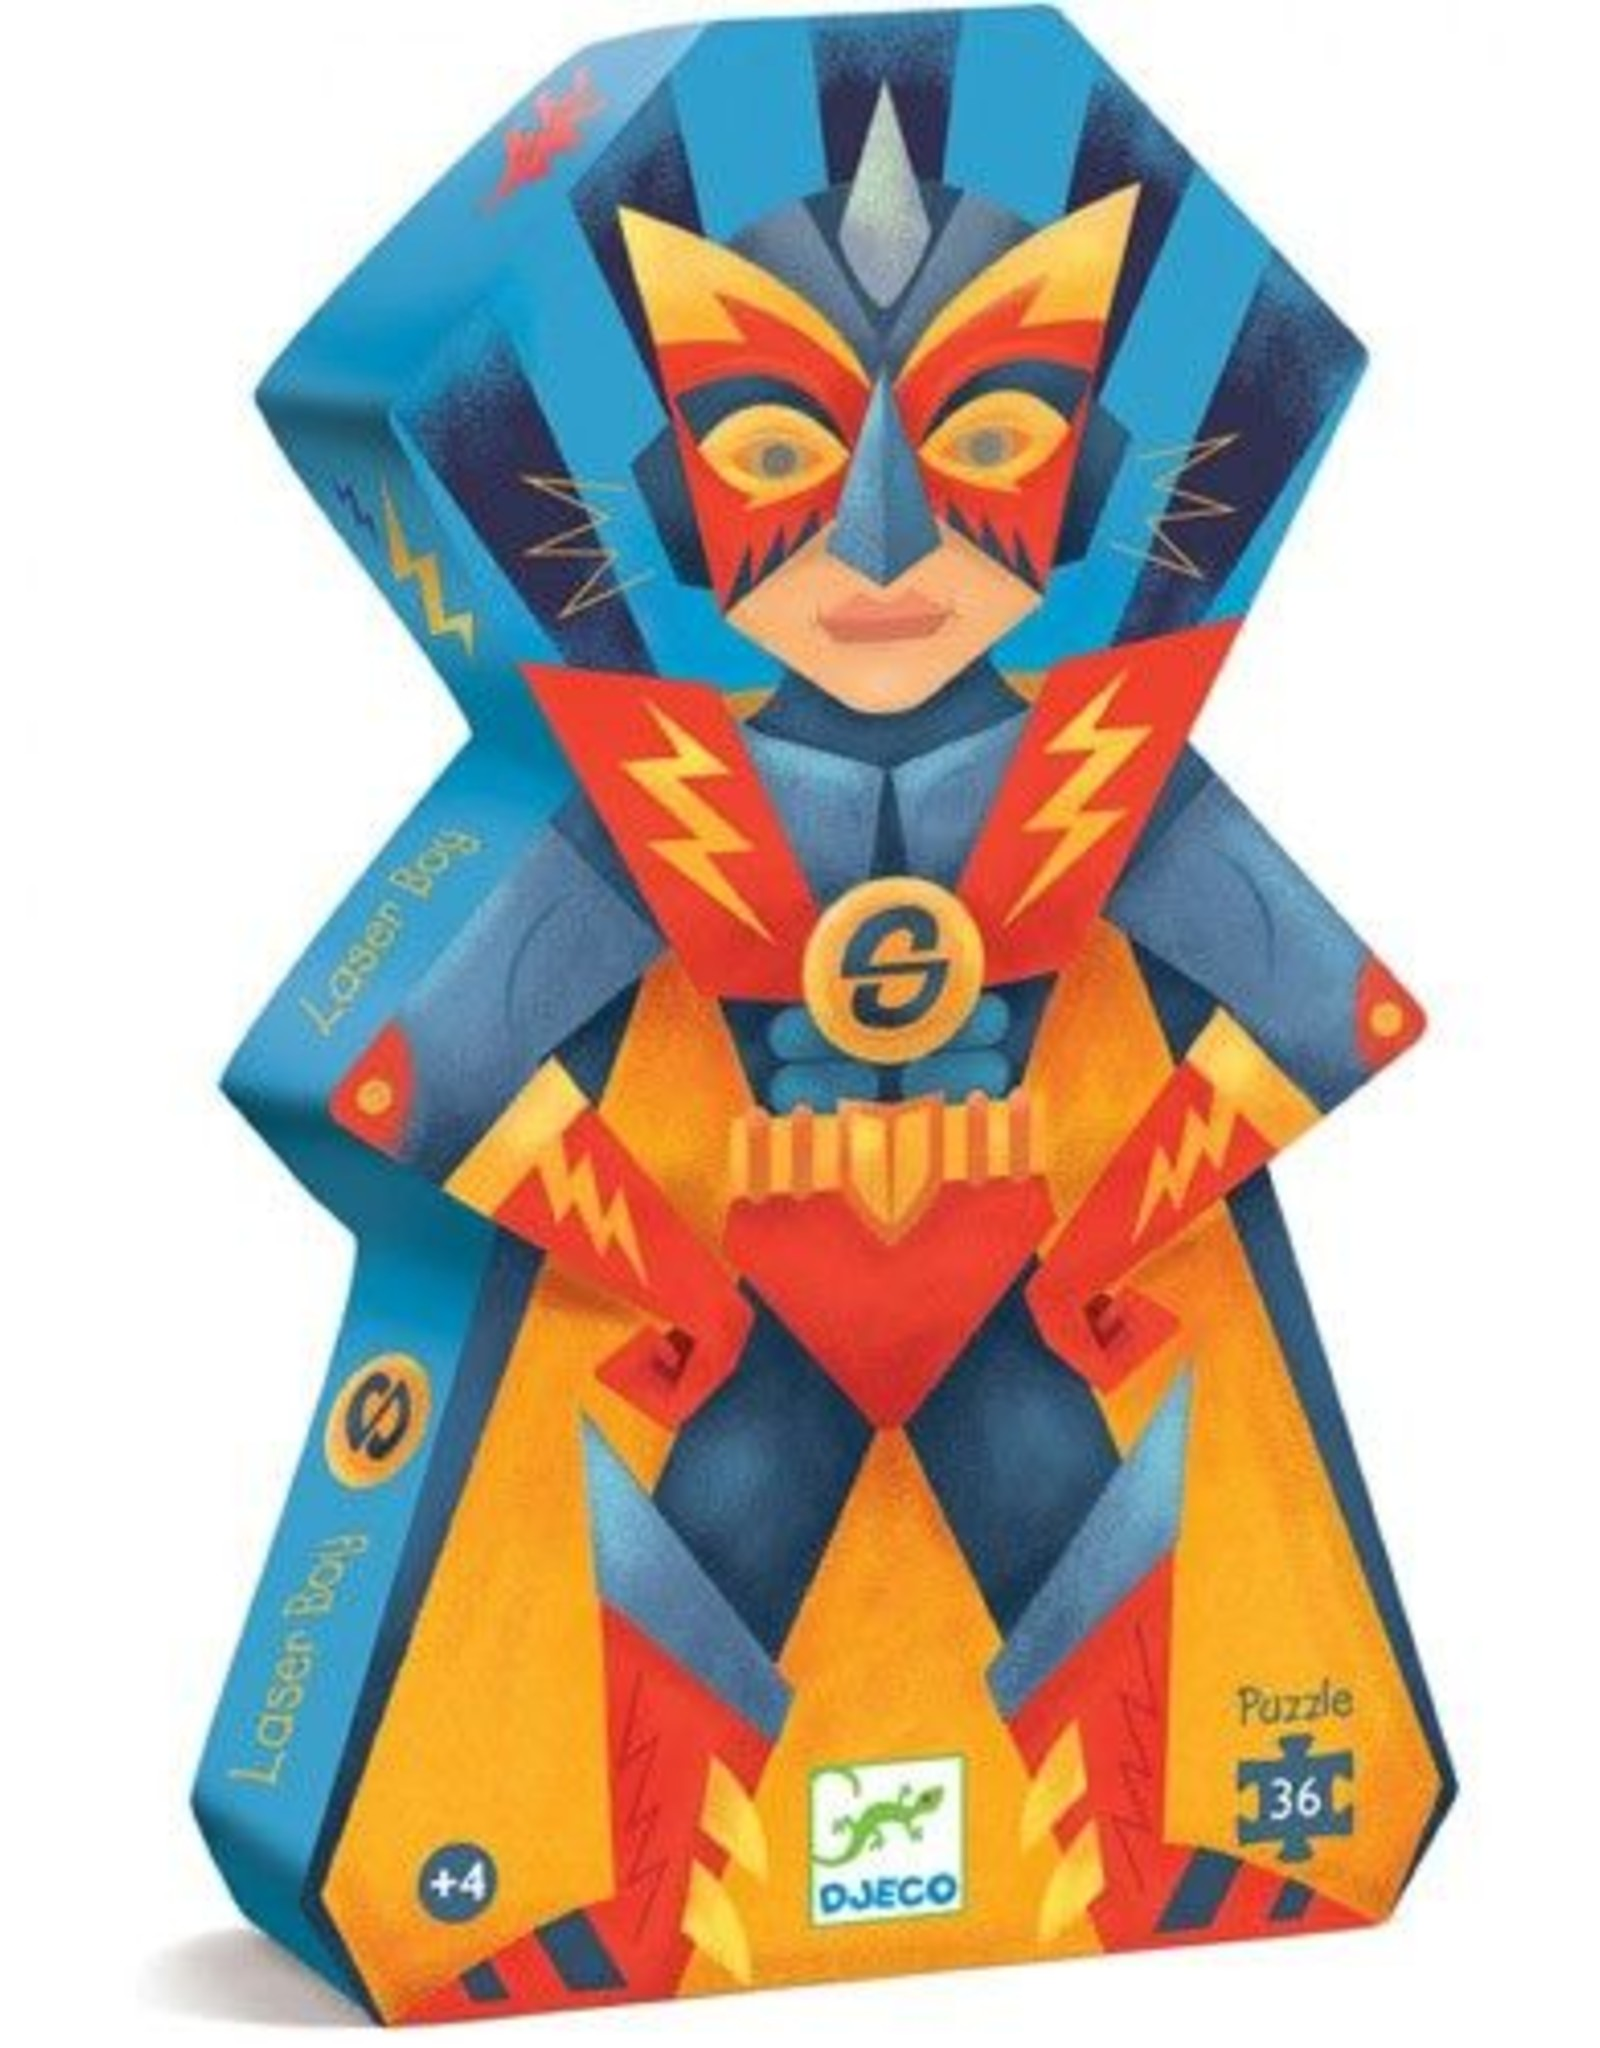 Djeco Puzzel Laser Boy